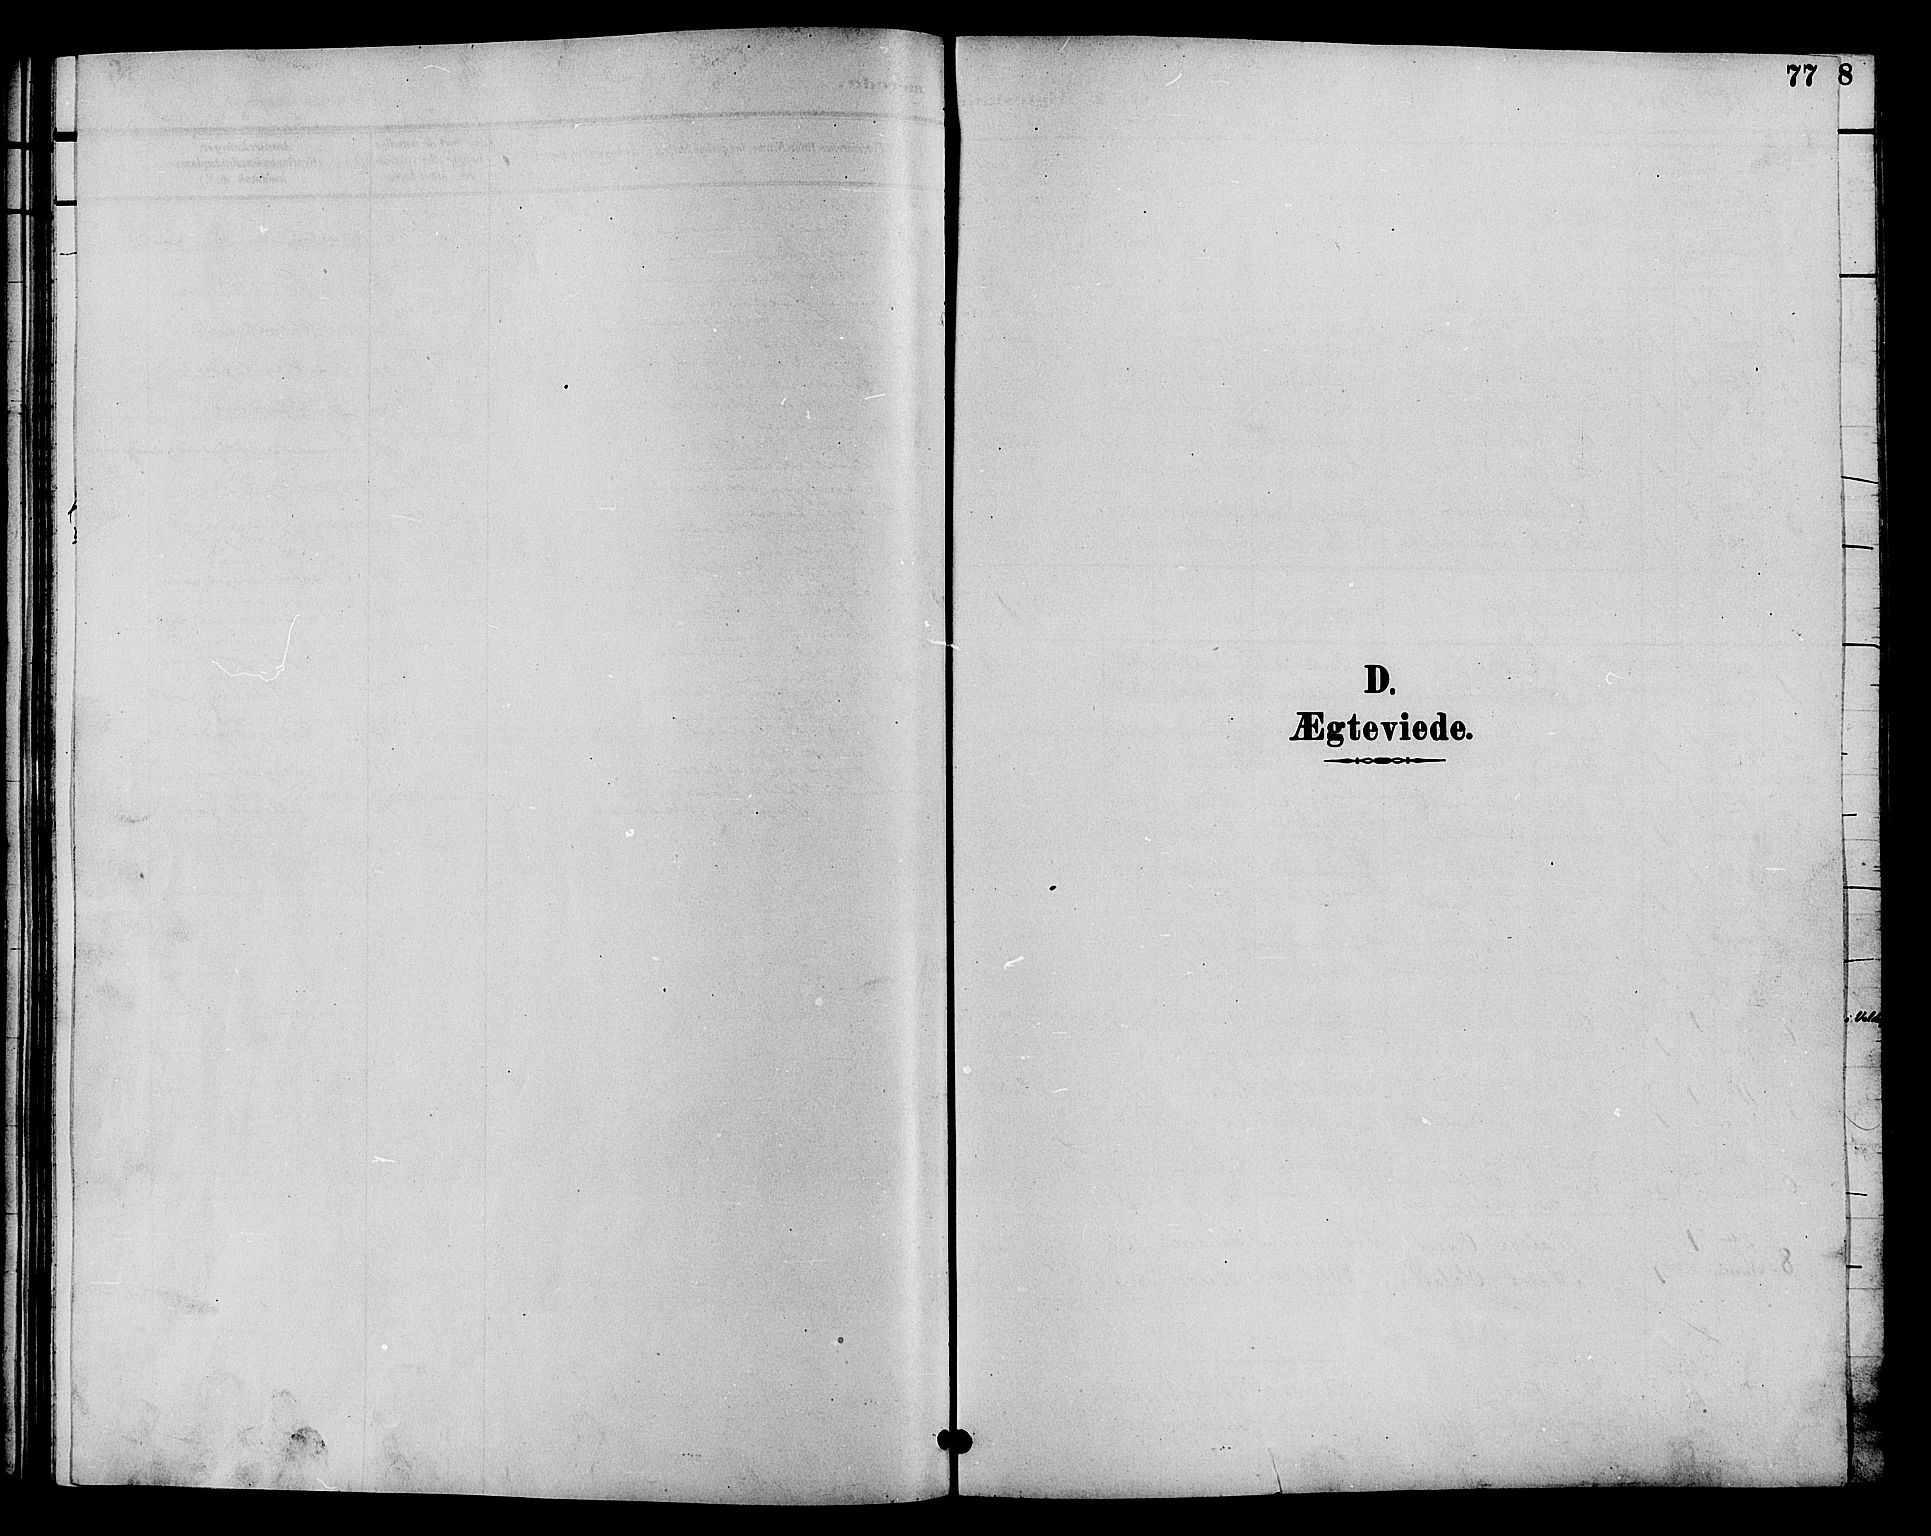 SAH, Øystre Slidre prestekontor, Klokkerbok nr. 4, 1887-1907, s. 77